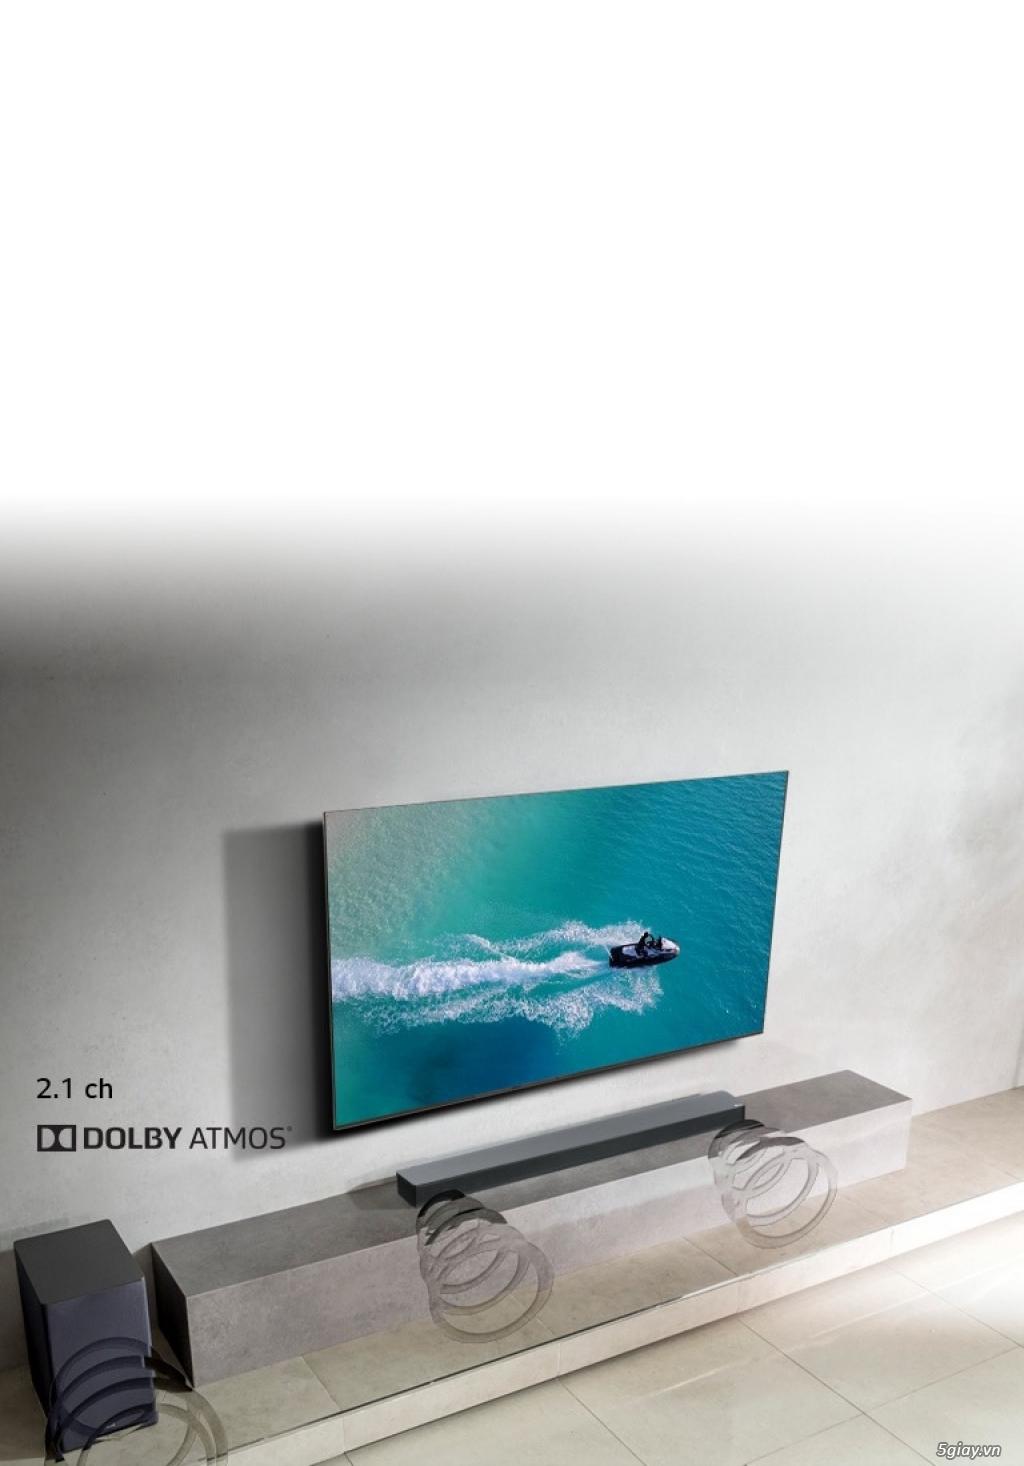 Loa soundbar LG Sk8 Sub ko dây cao cấp 360W new nguyên seal - 2